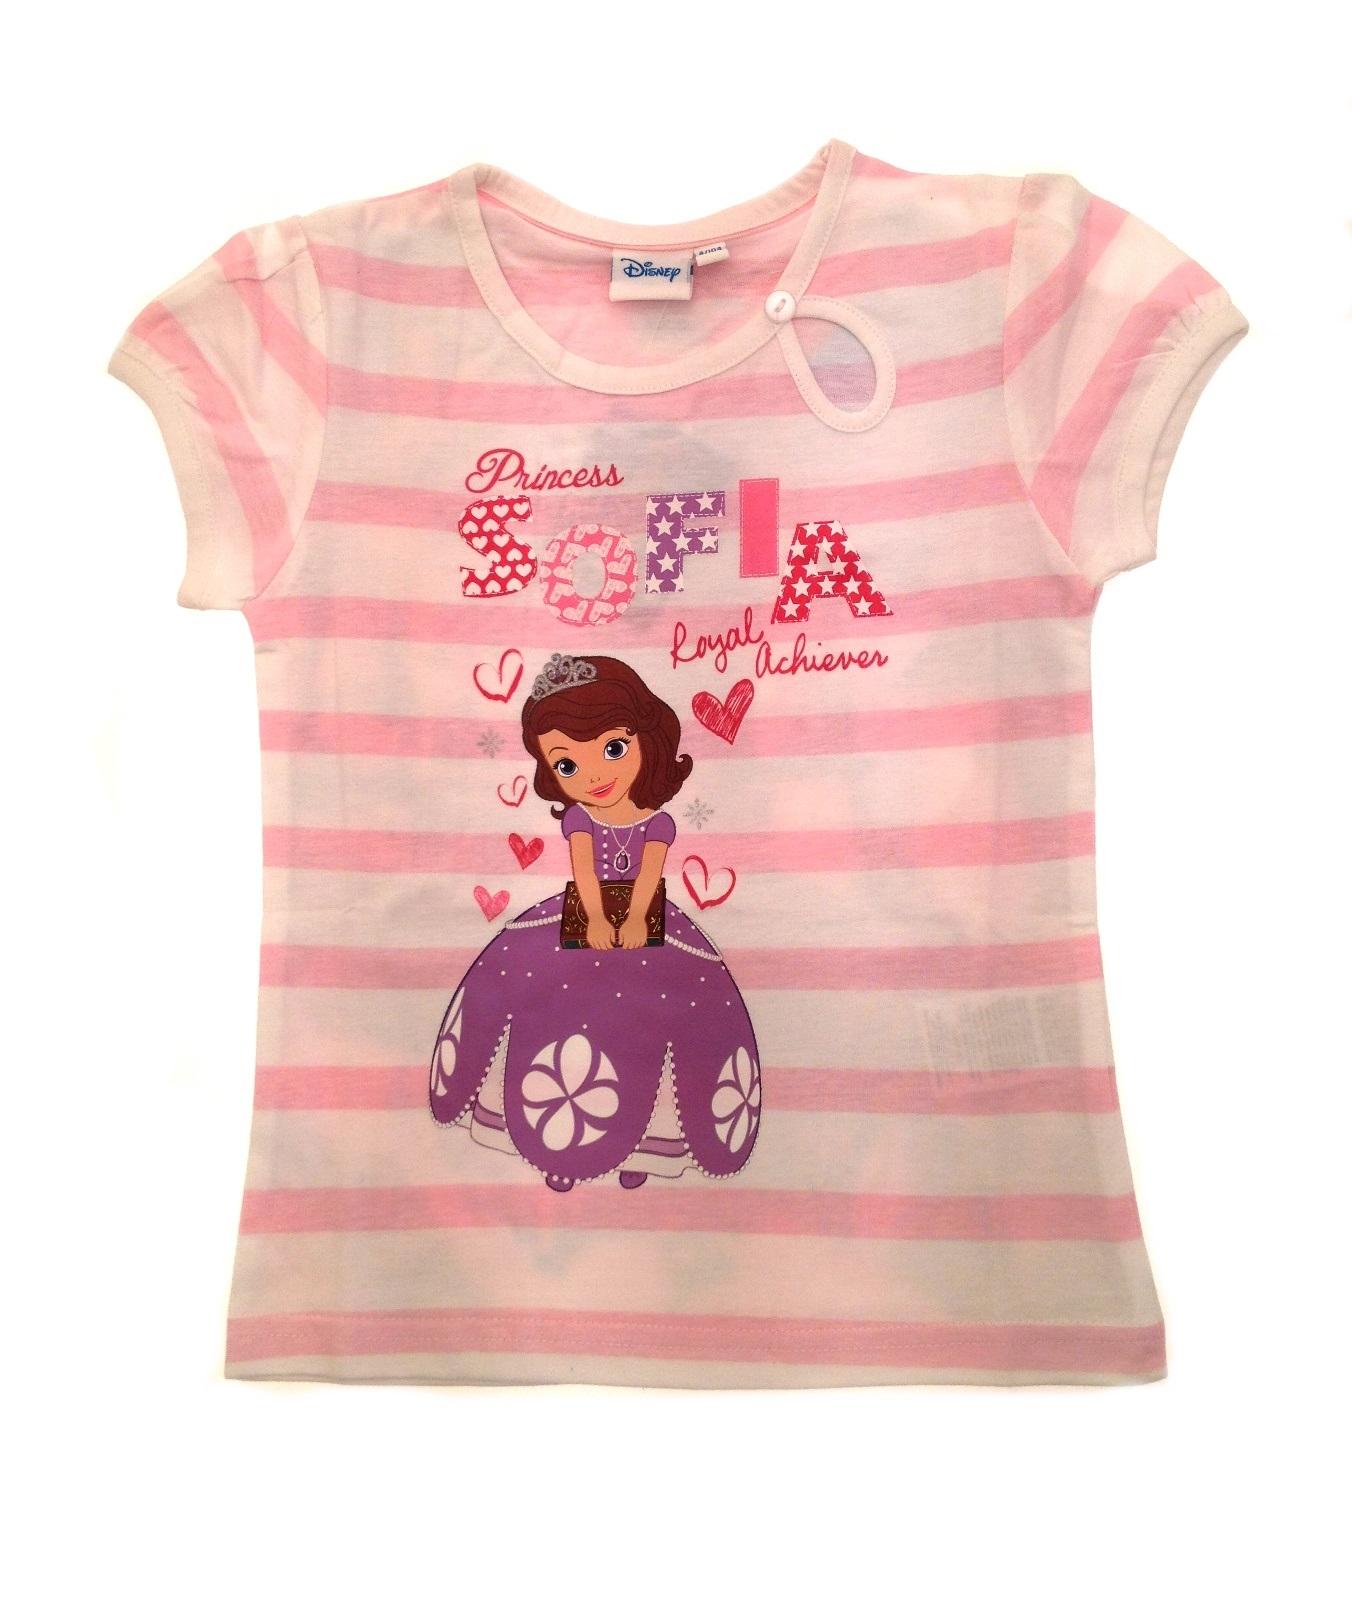 Disney Princess Sofia T Shirt Short Sleeved Top Girls ...